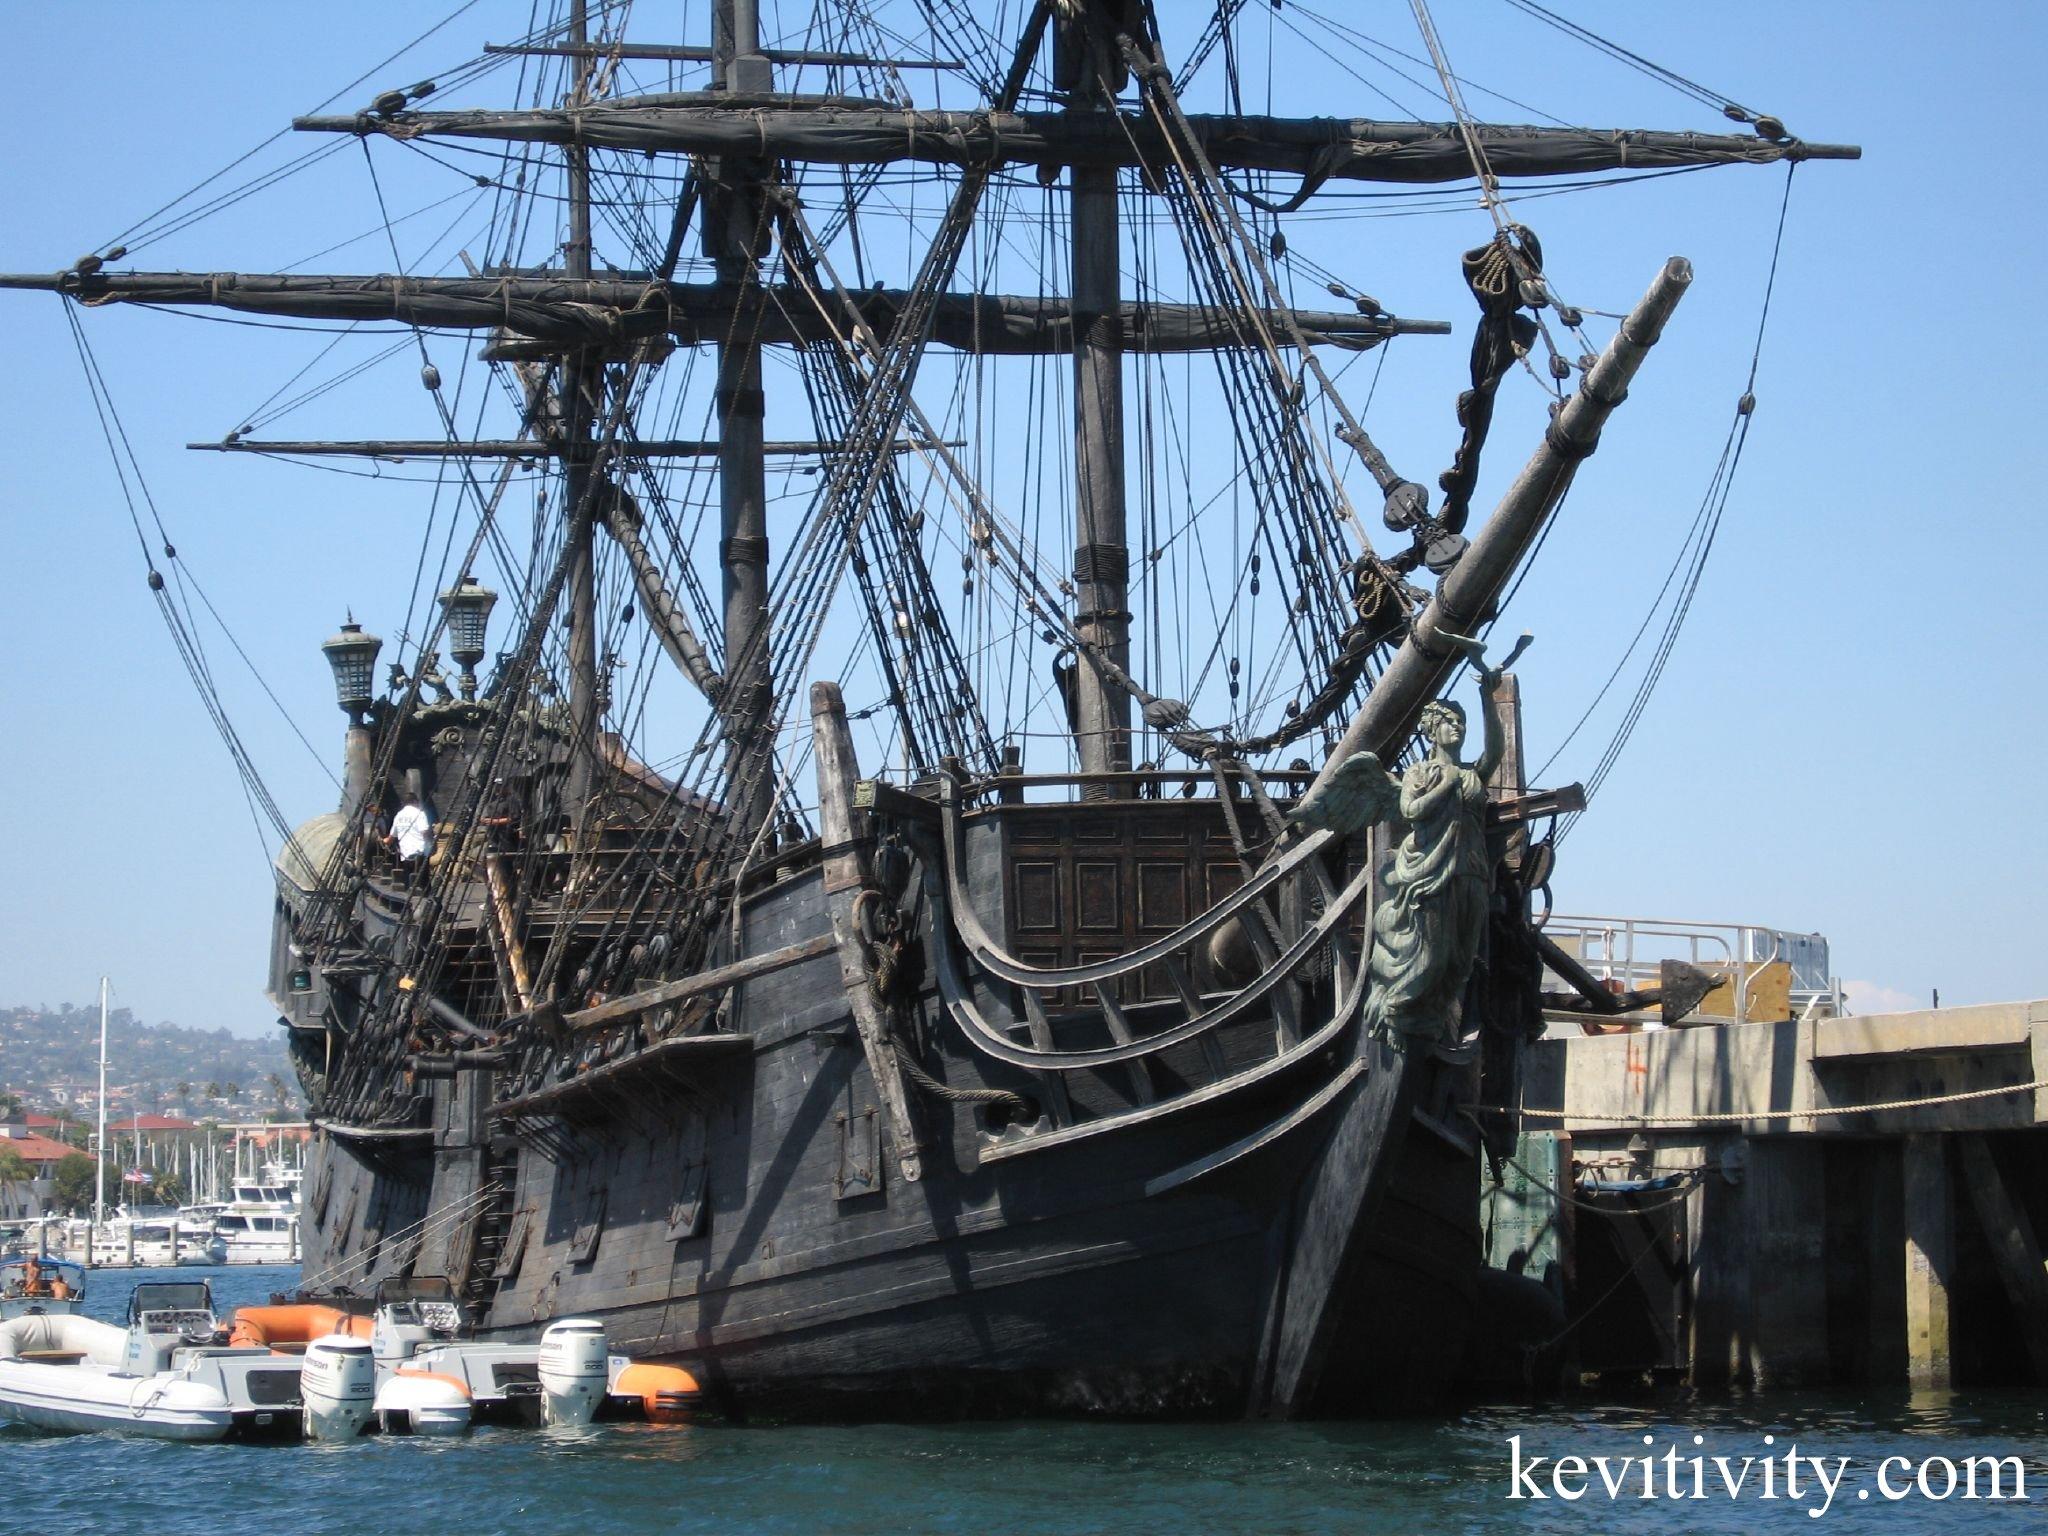 File:The Black Pearl, San Pedro Harbor.jpg - Wikipedia